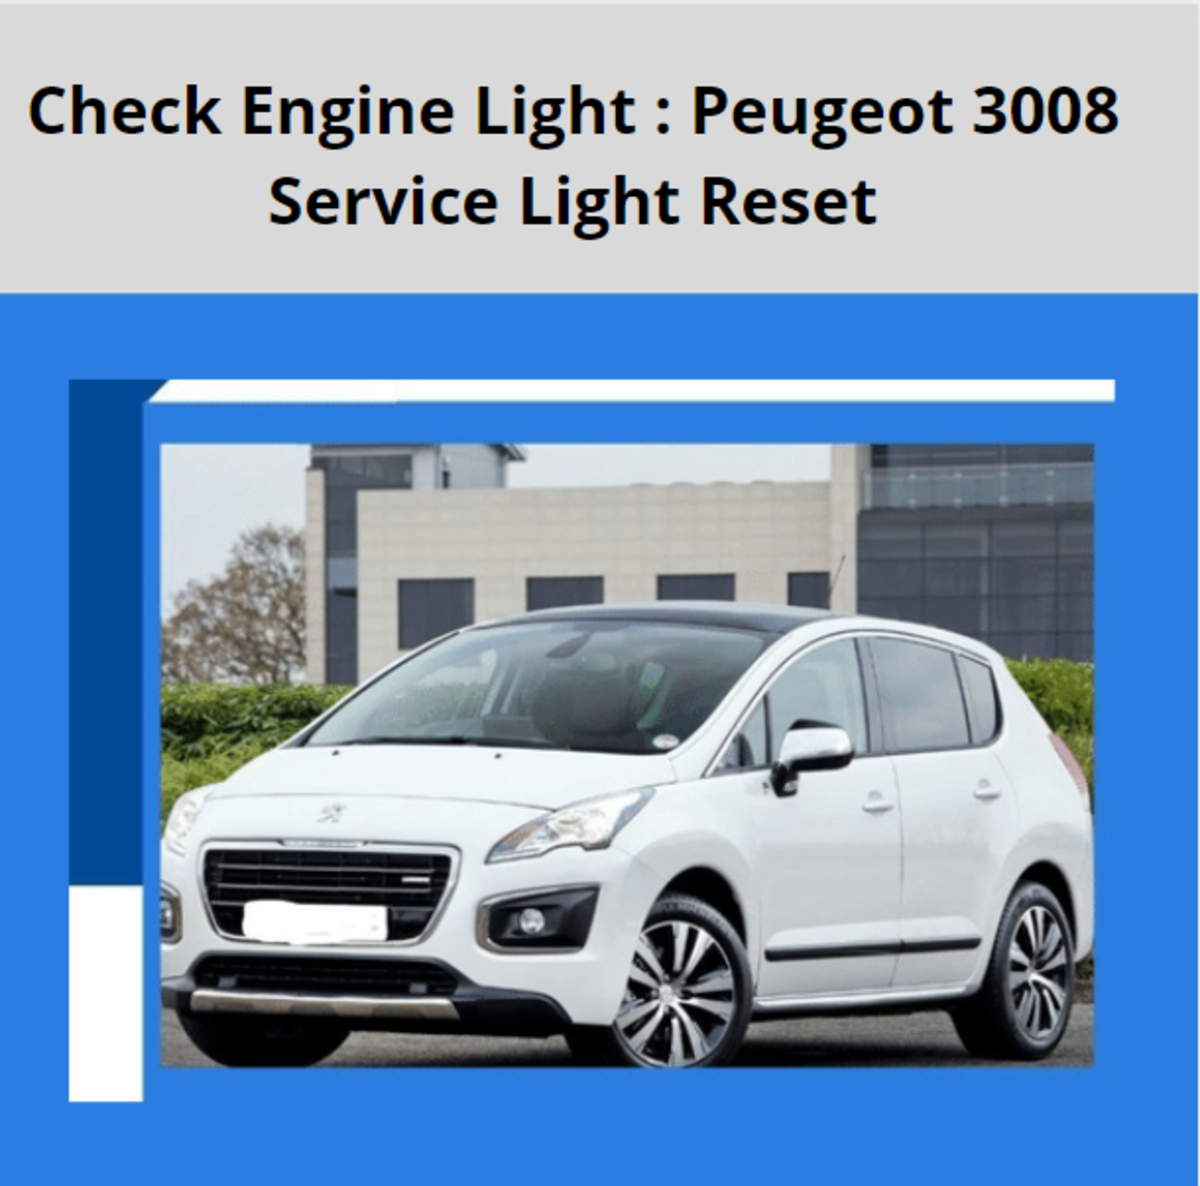 Check Engine Light : Peugeot 3008 Service Light Reset.